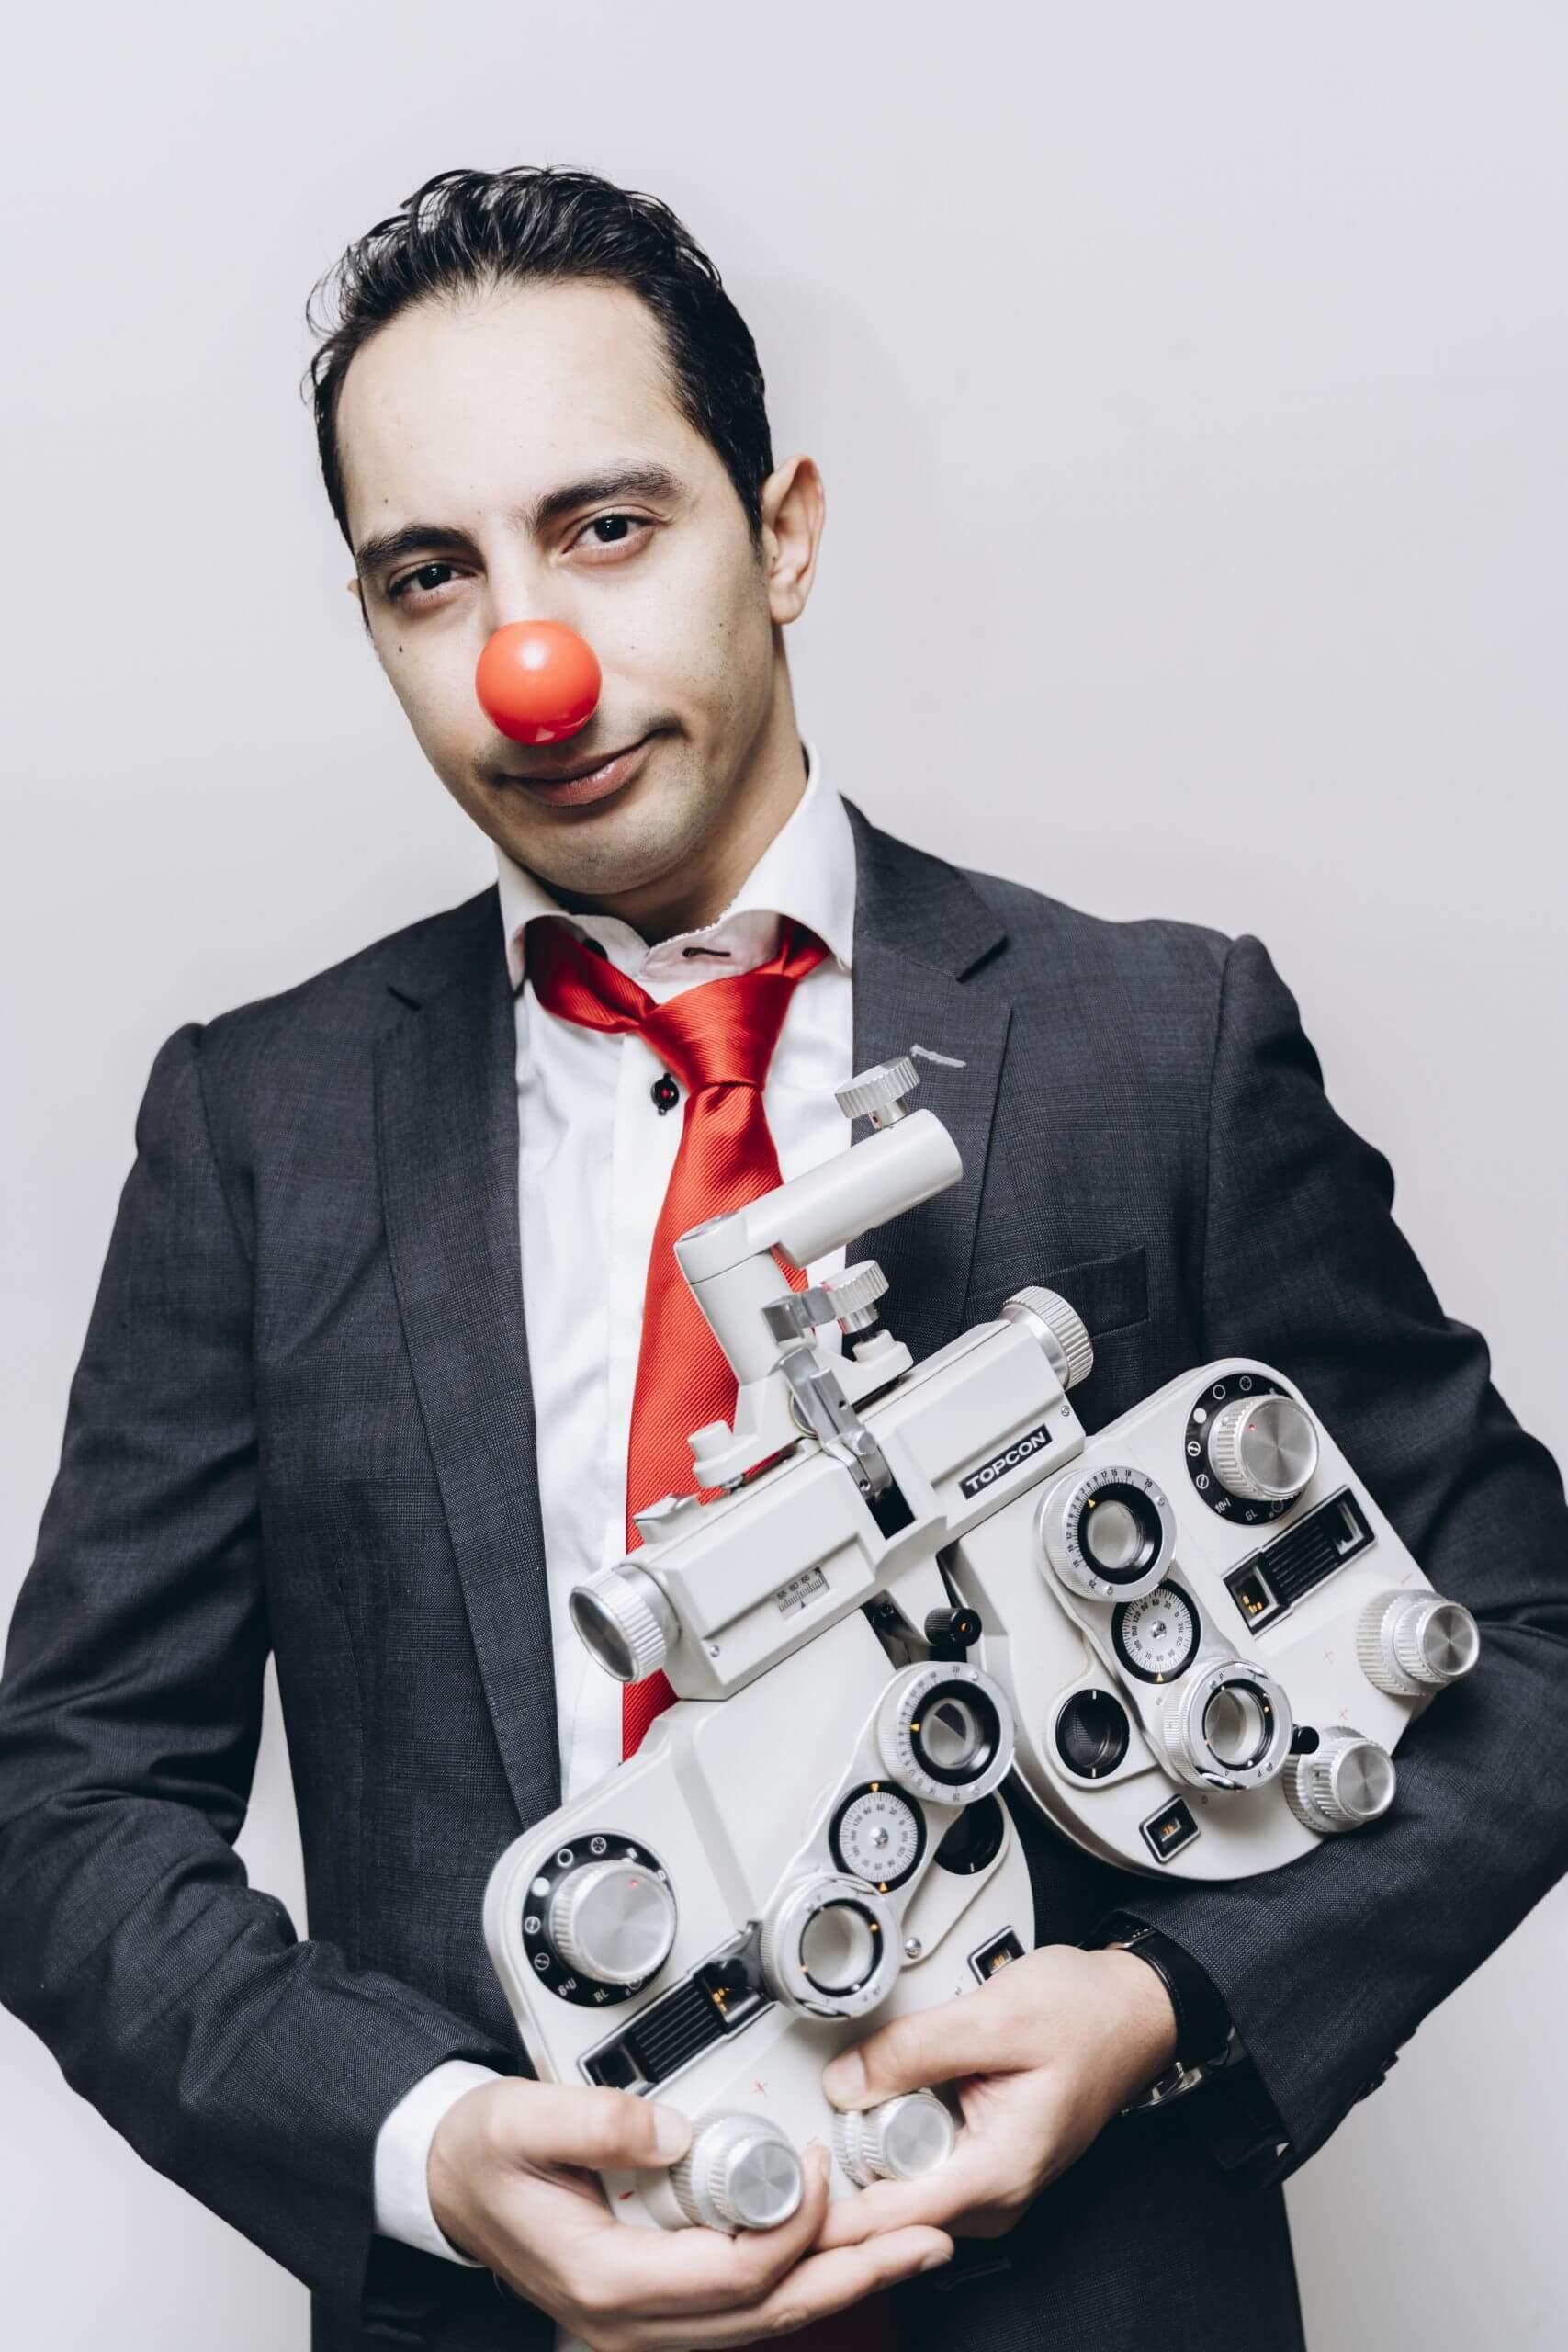 Hassan el Rahaui - Sterkte! - Foto Duy VuDinh